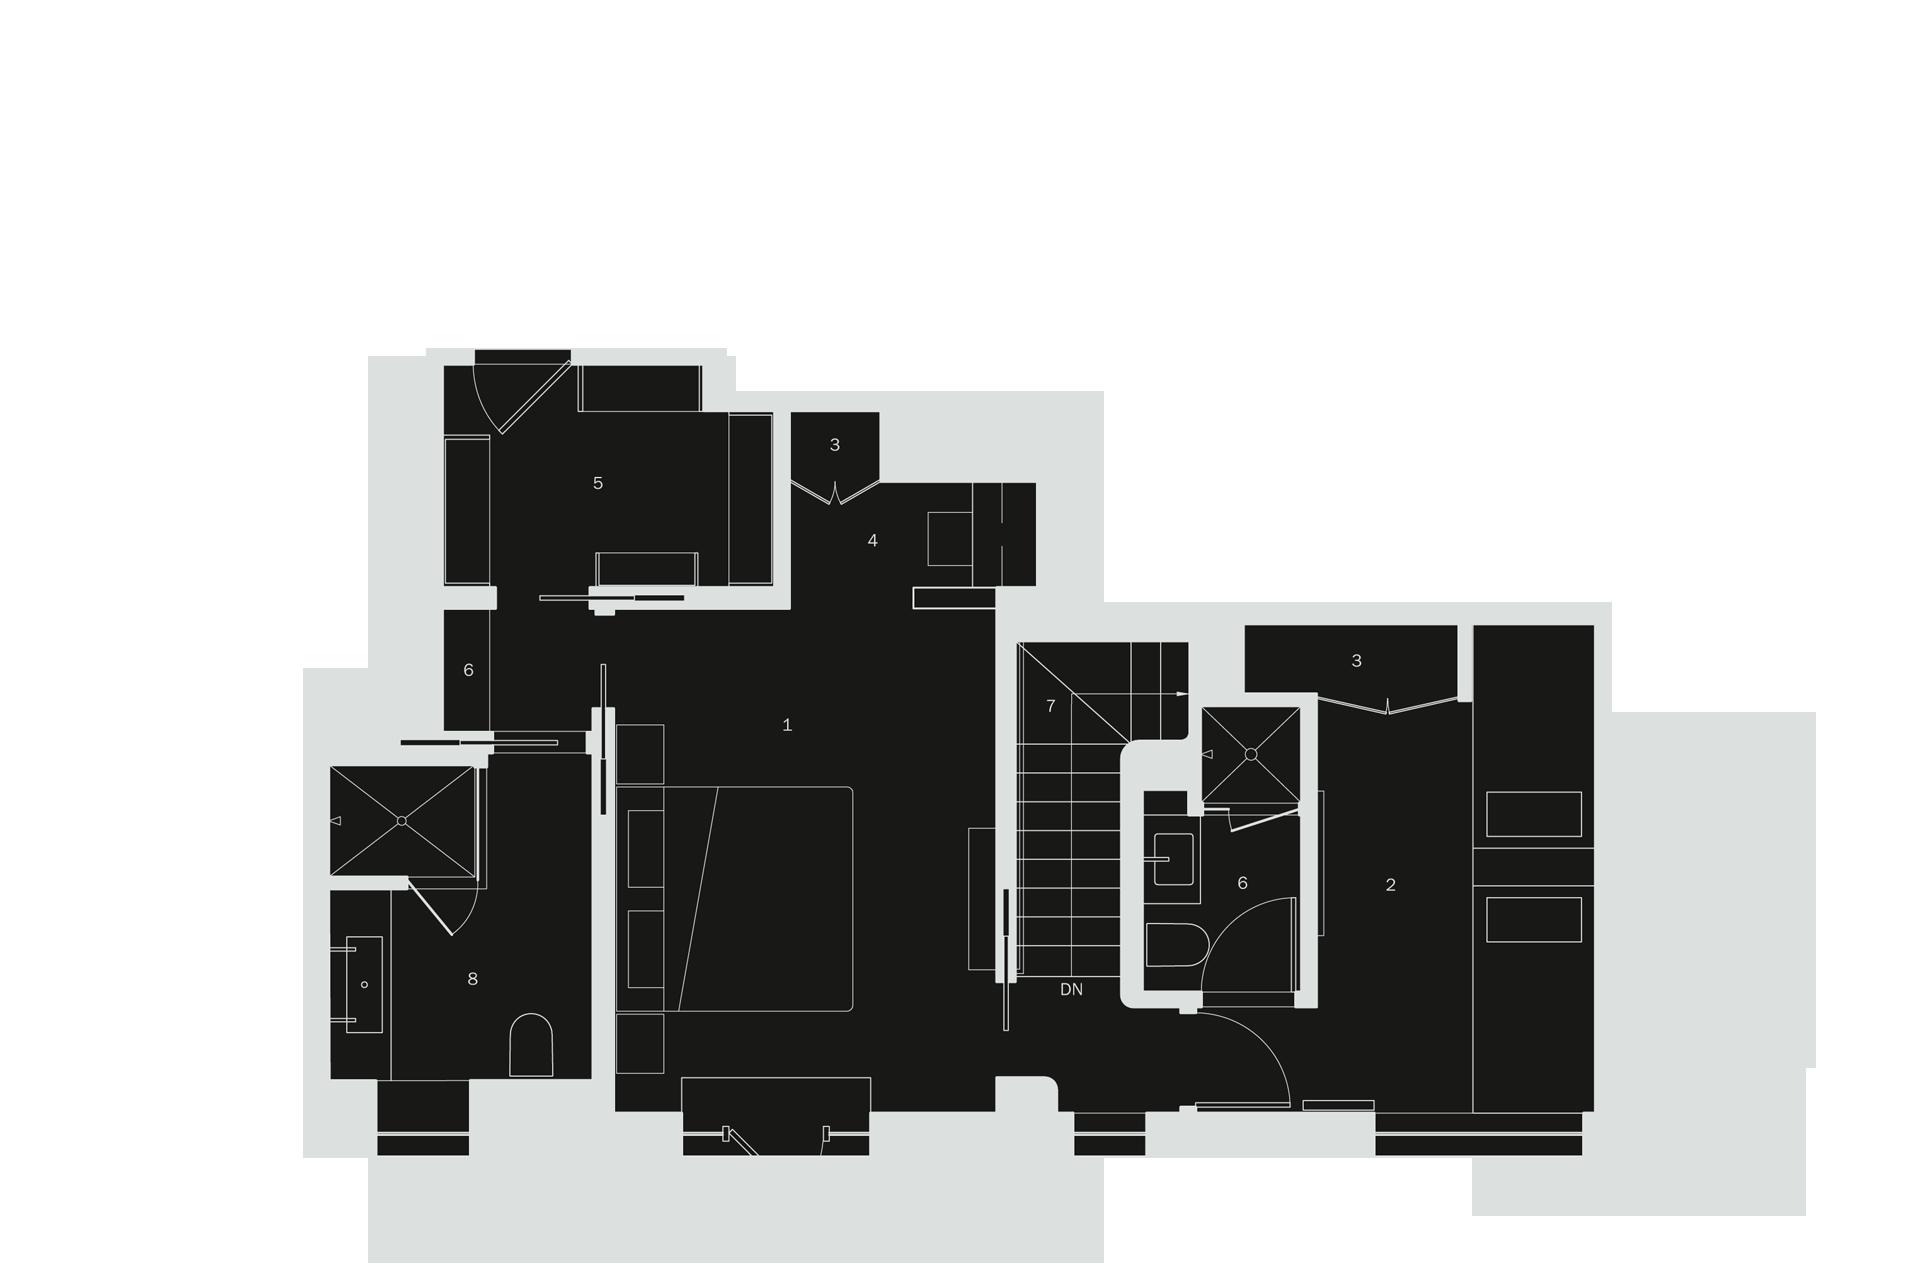 test floorplan 2